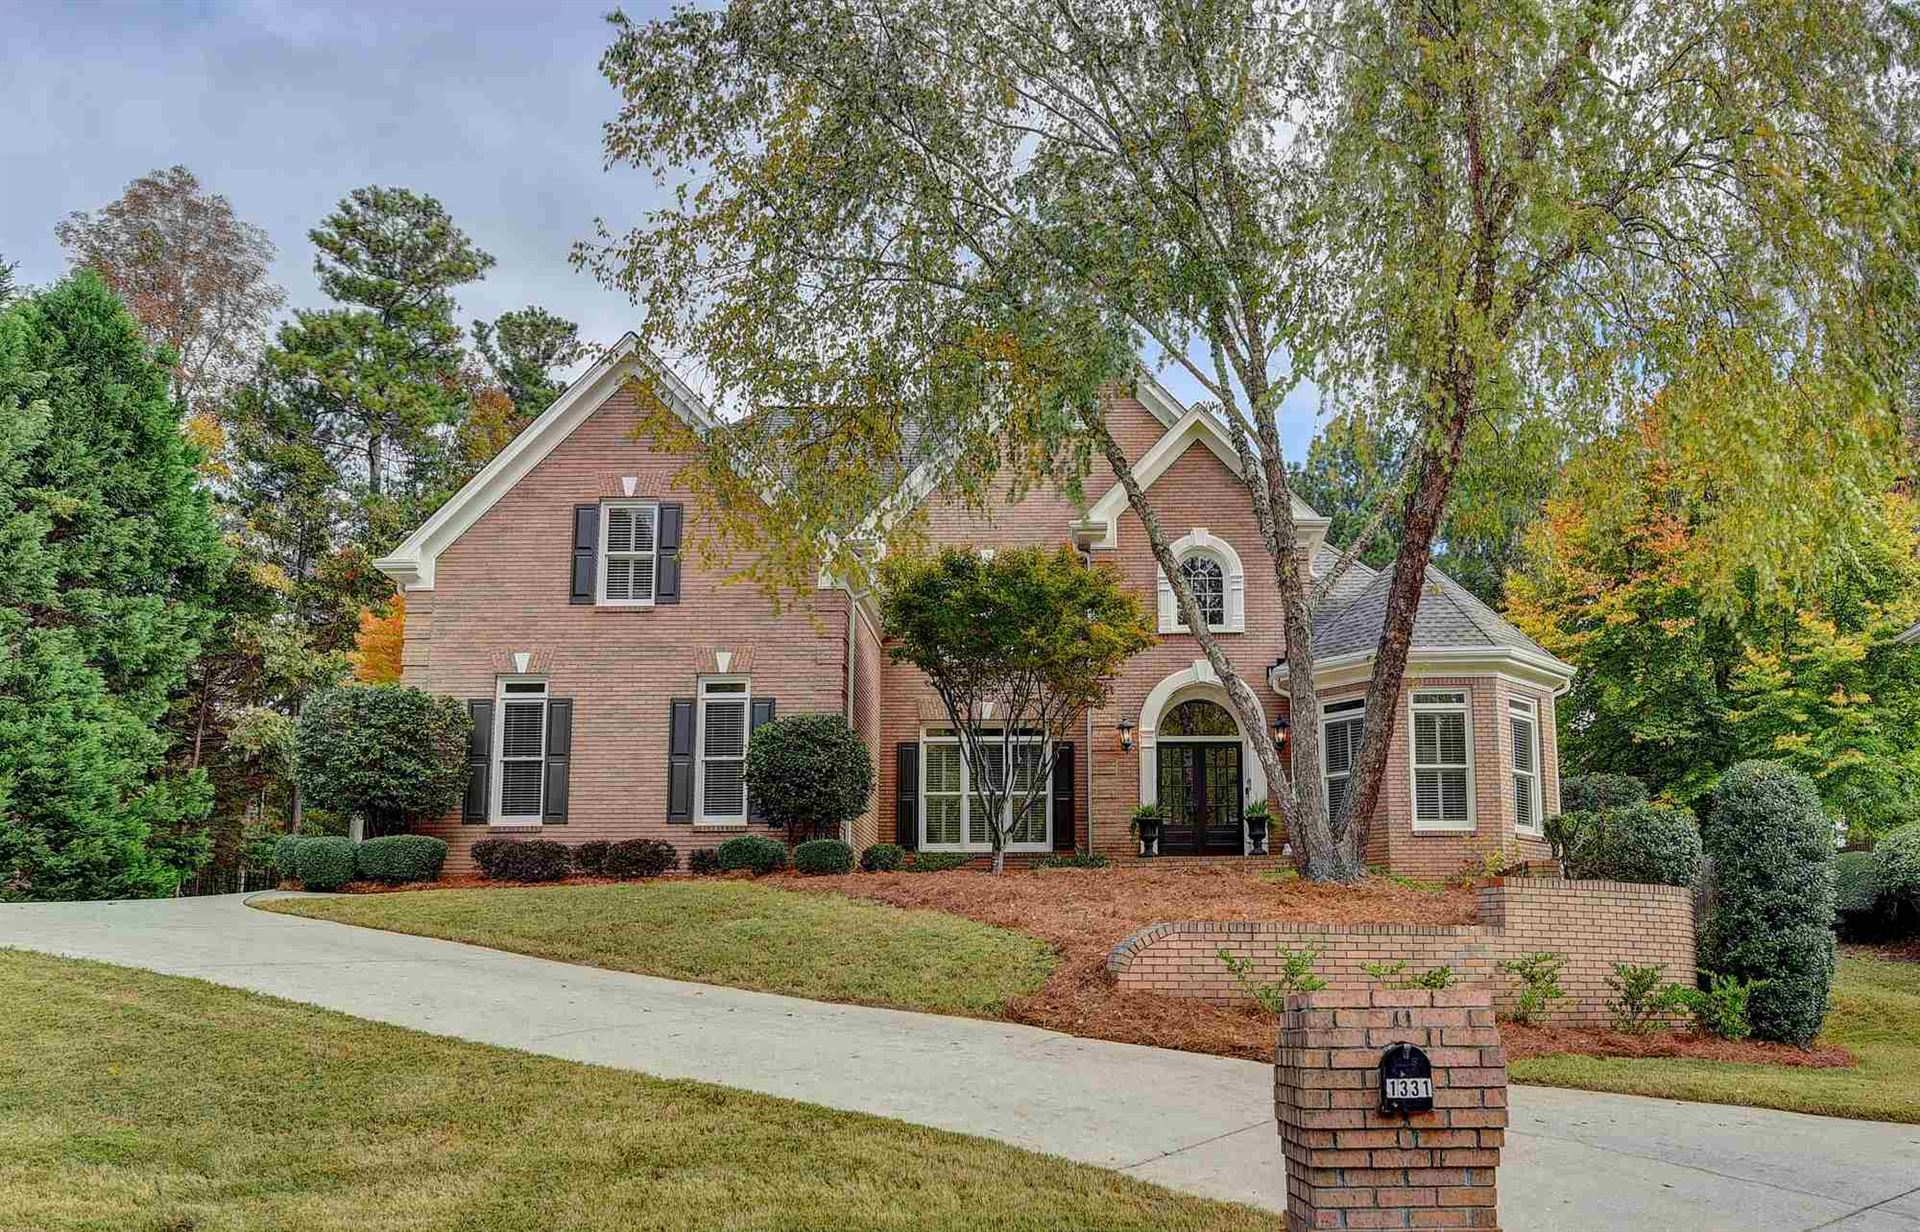 1331 Annapolis Way, Grayson, GA 30017 - MLS#: 8892713